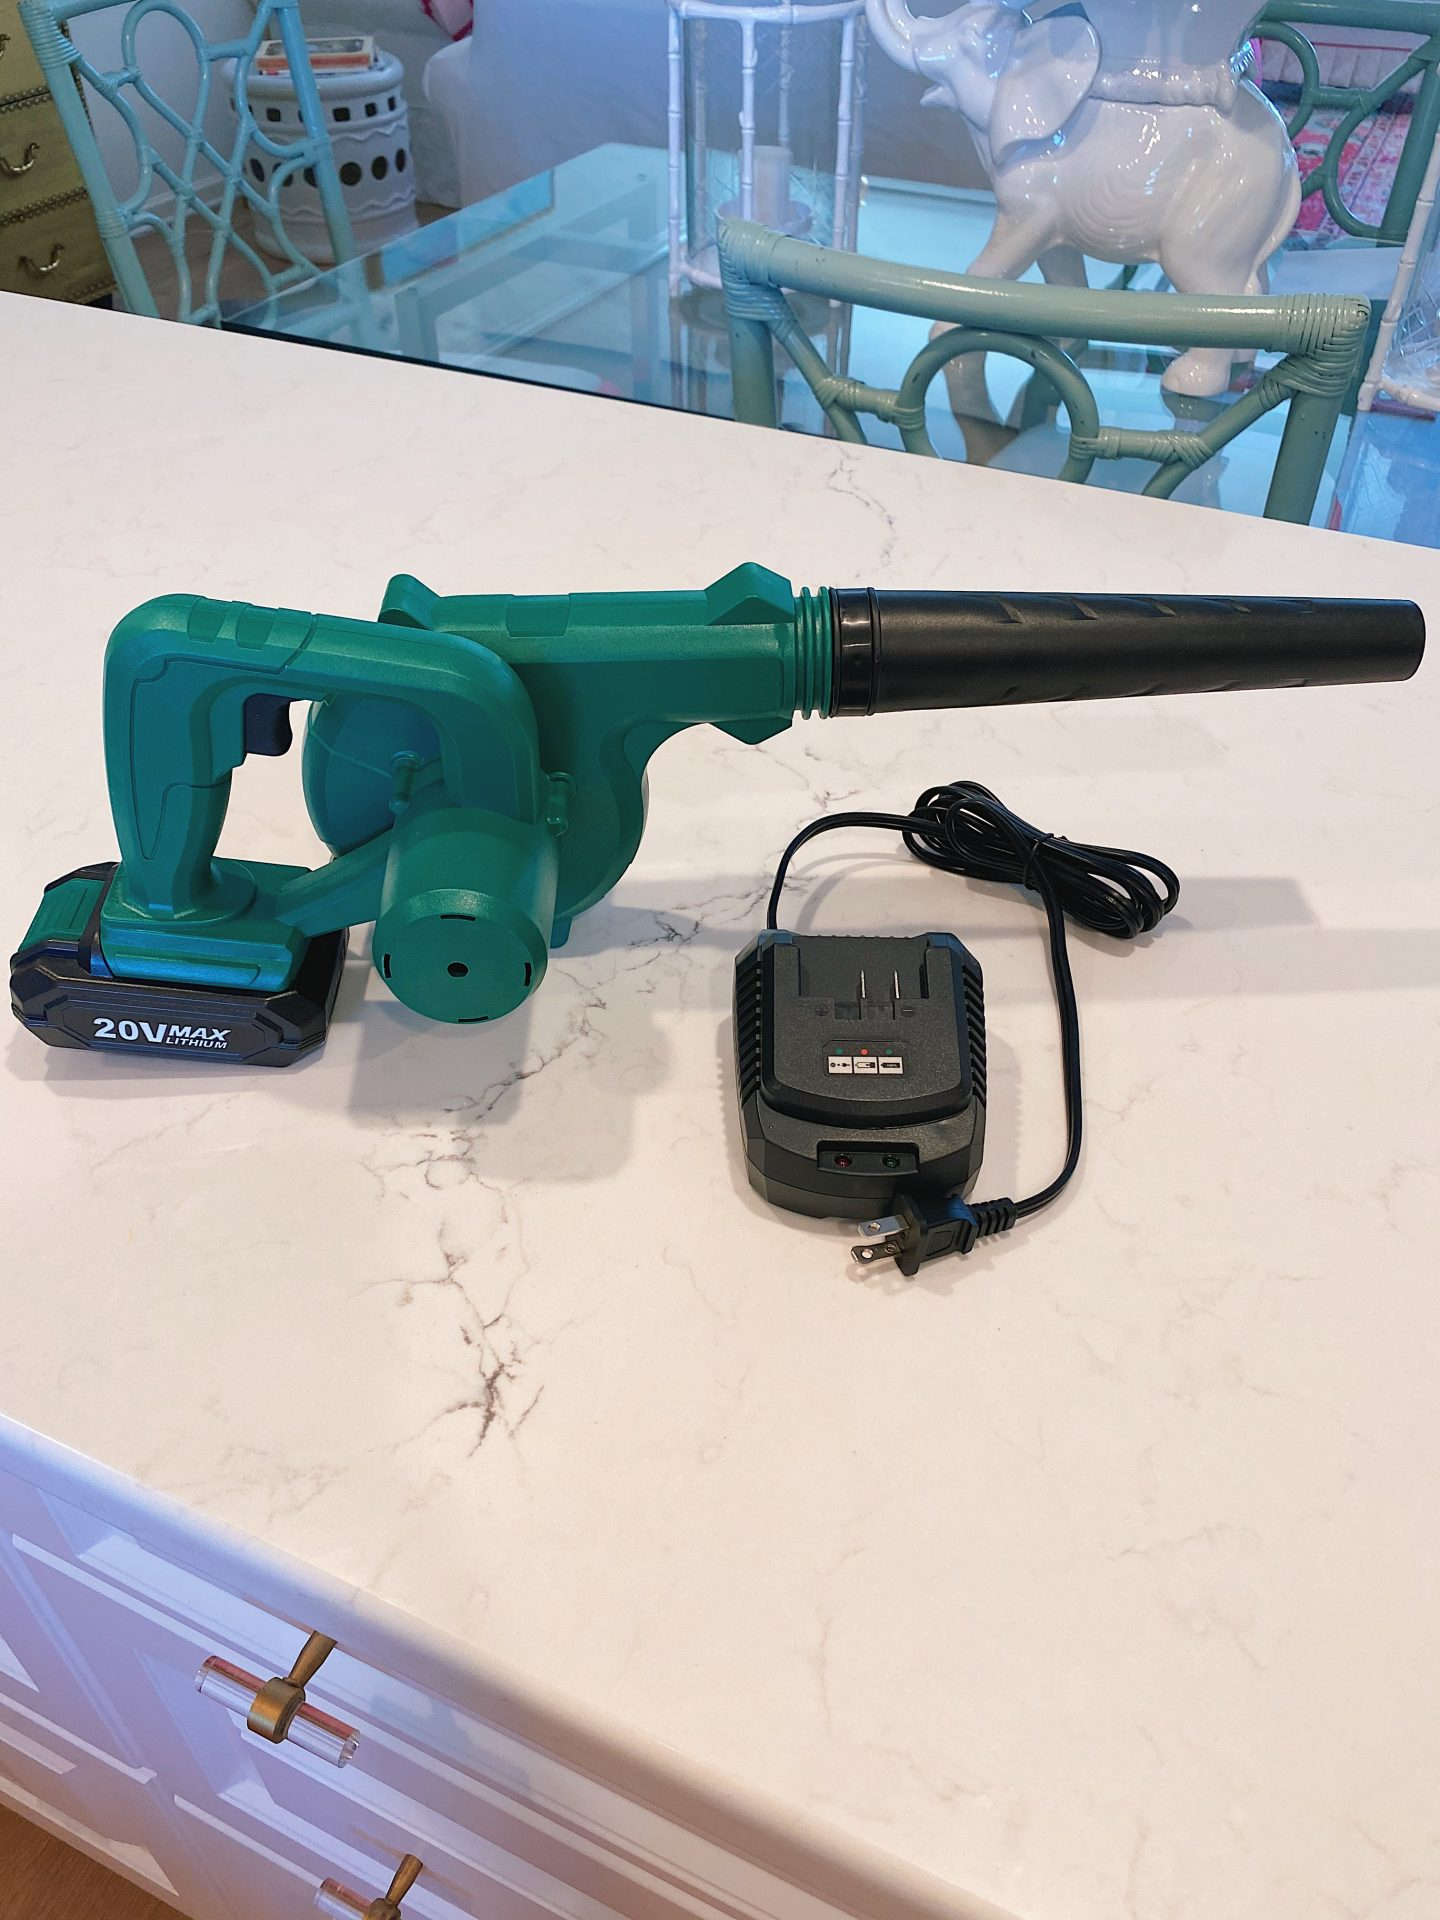 Amazon cordless leaf blower/vacuum